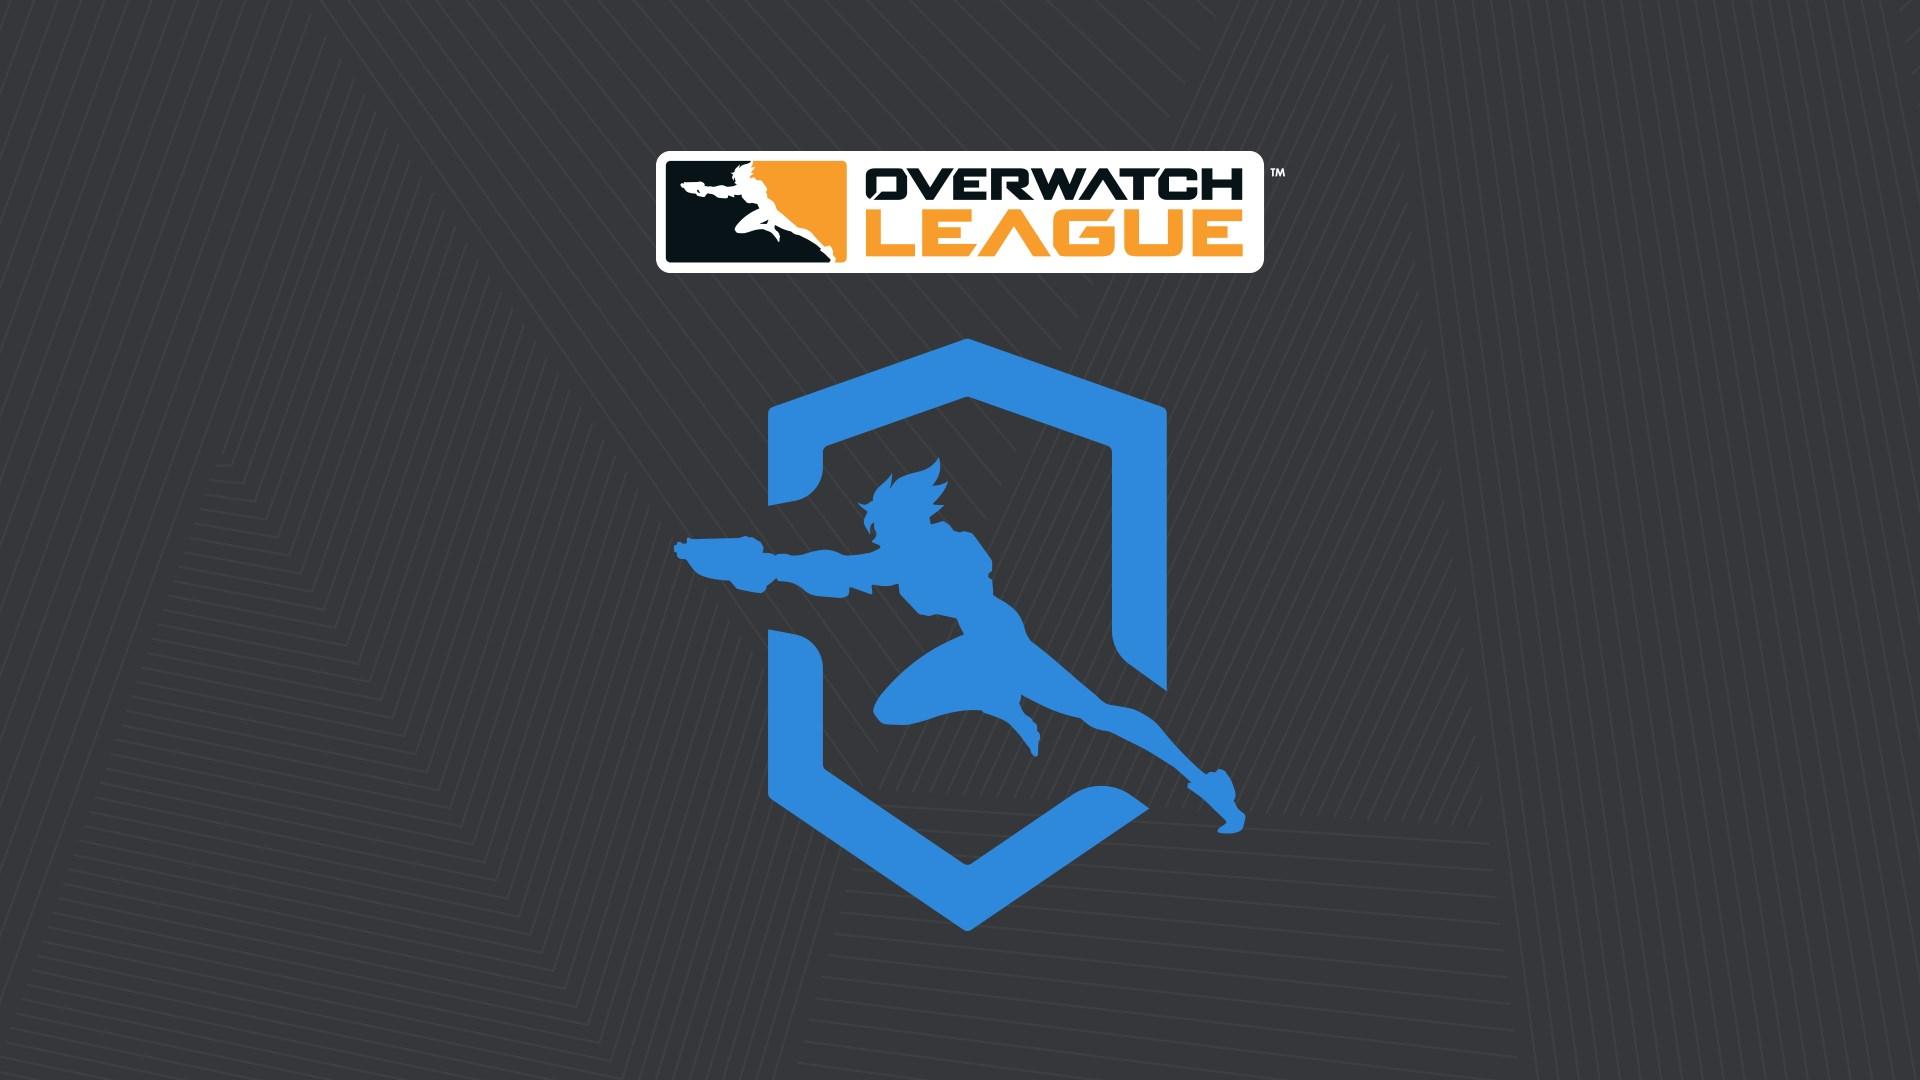 Liga Overwatch™ - 100 Fichas da Liga